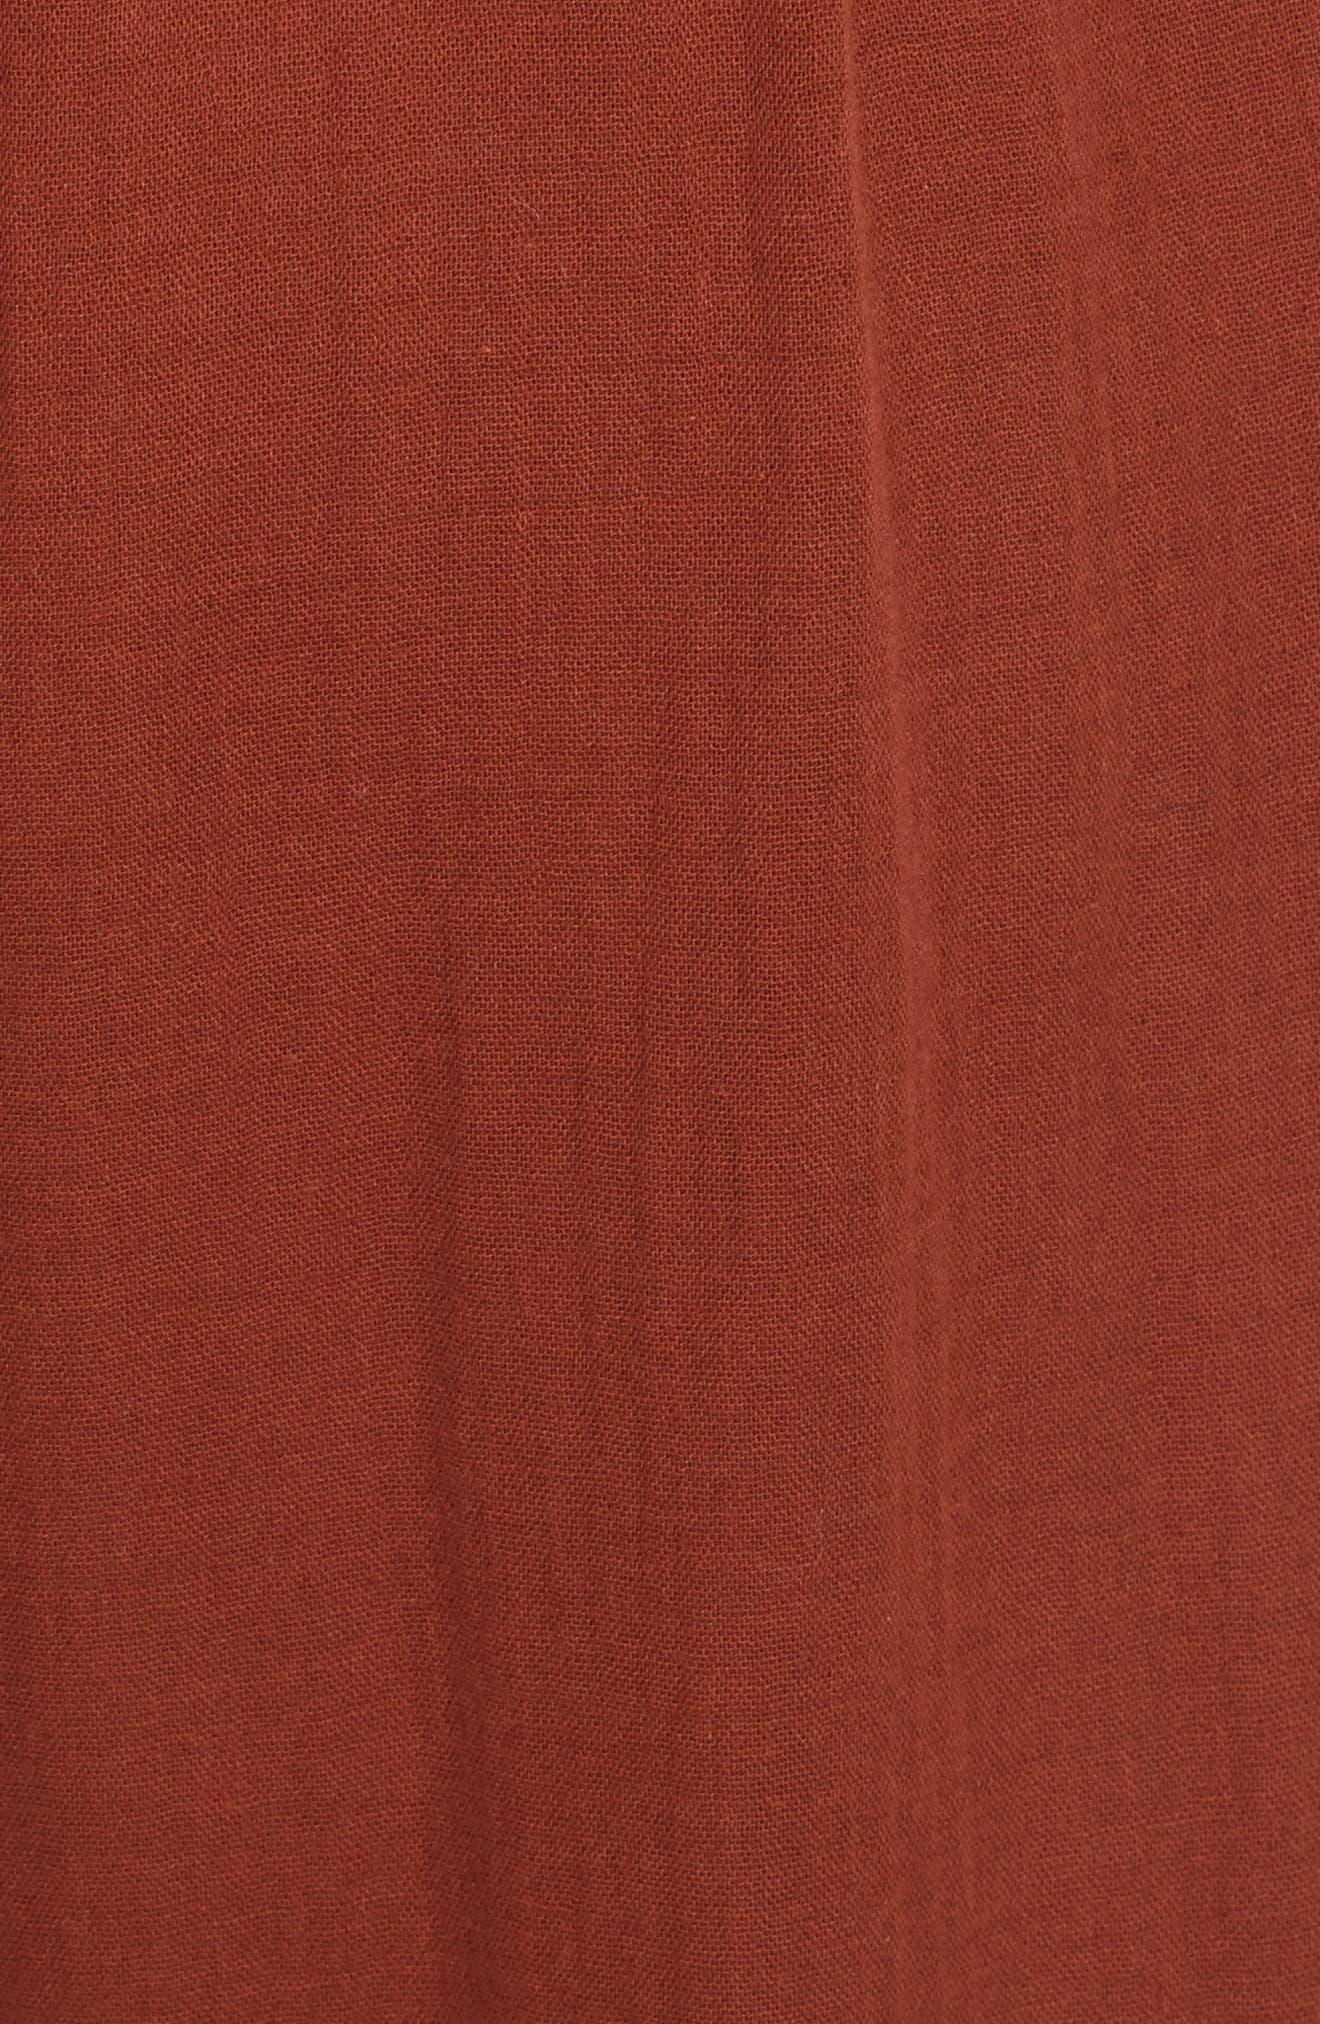 Sleeveless V-Neck Jumpsuit,                             Alternate thumbnail 5, color,                             Mahogany